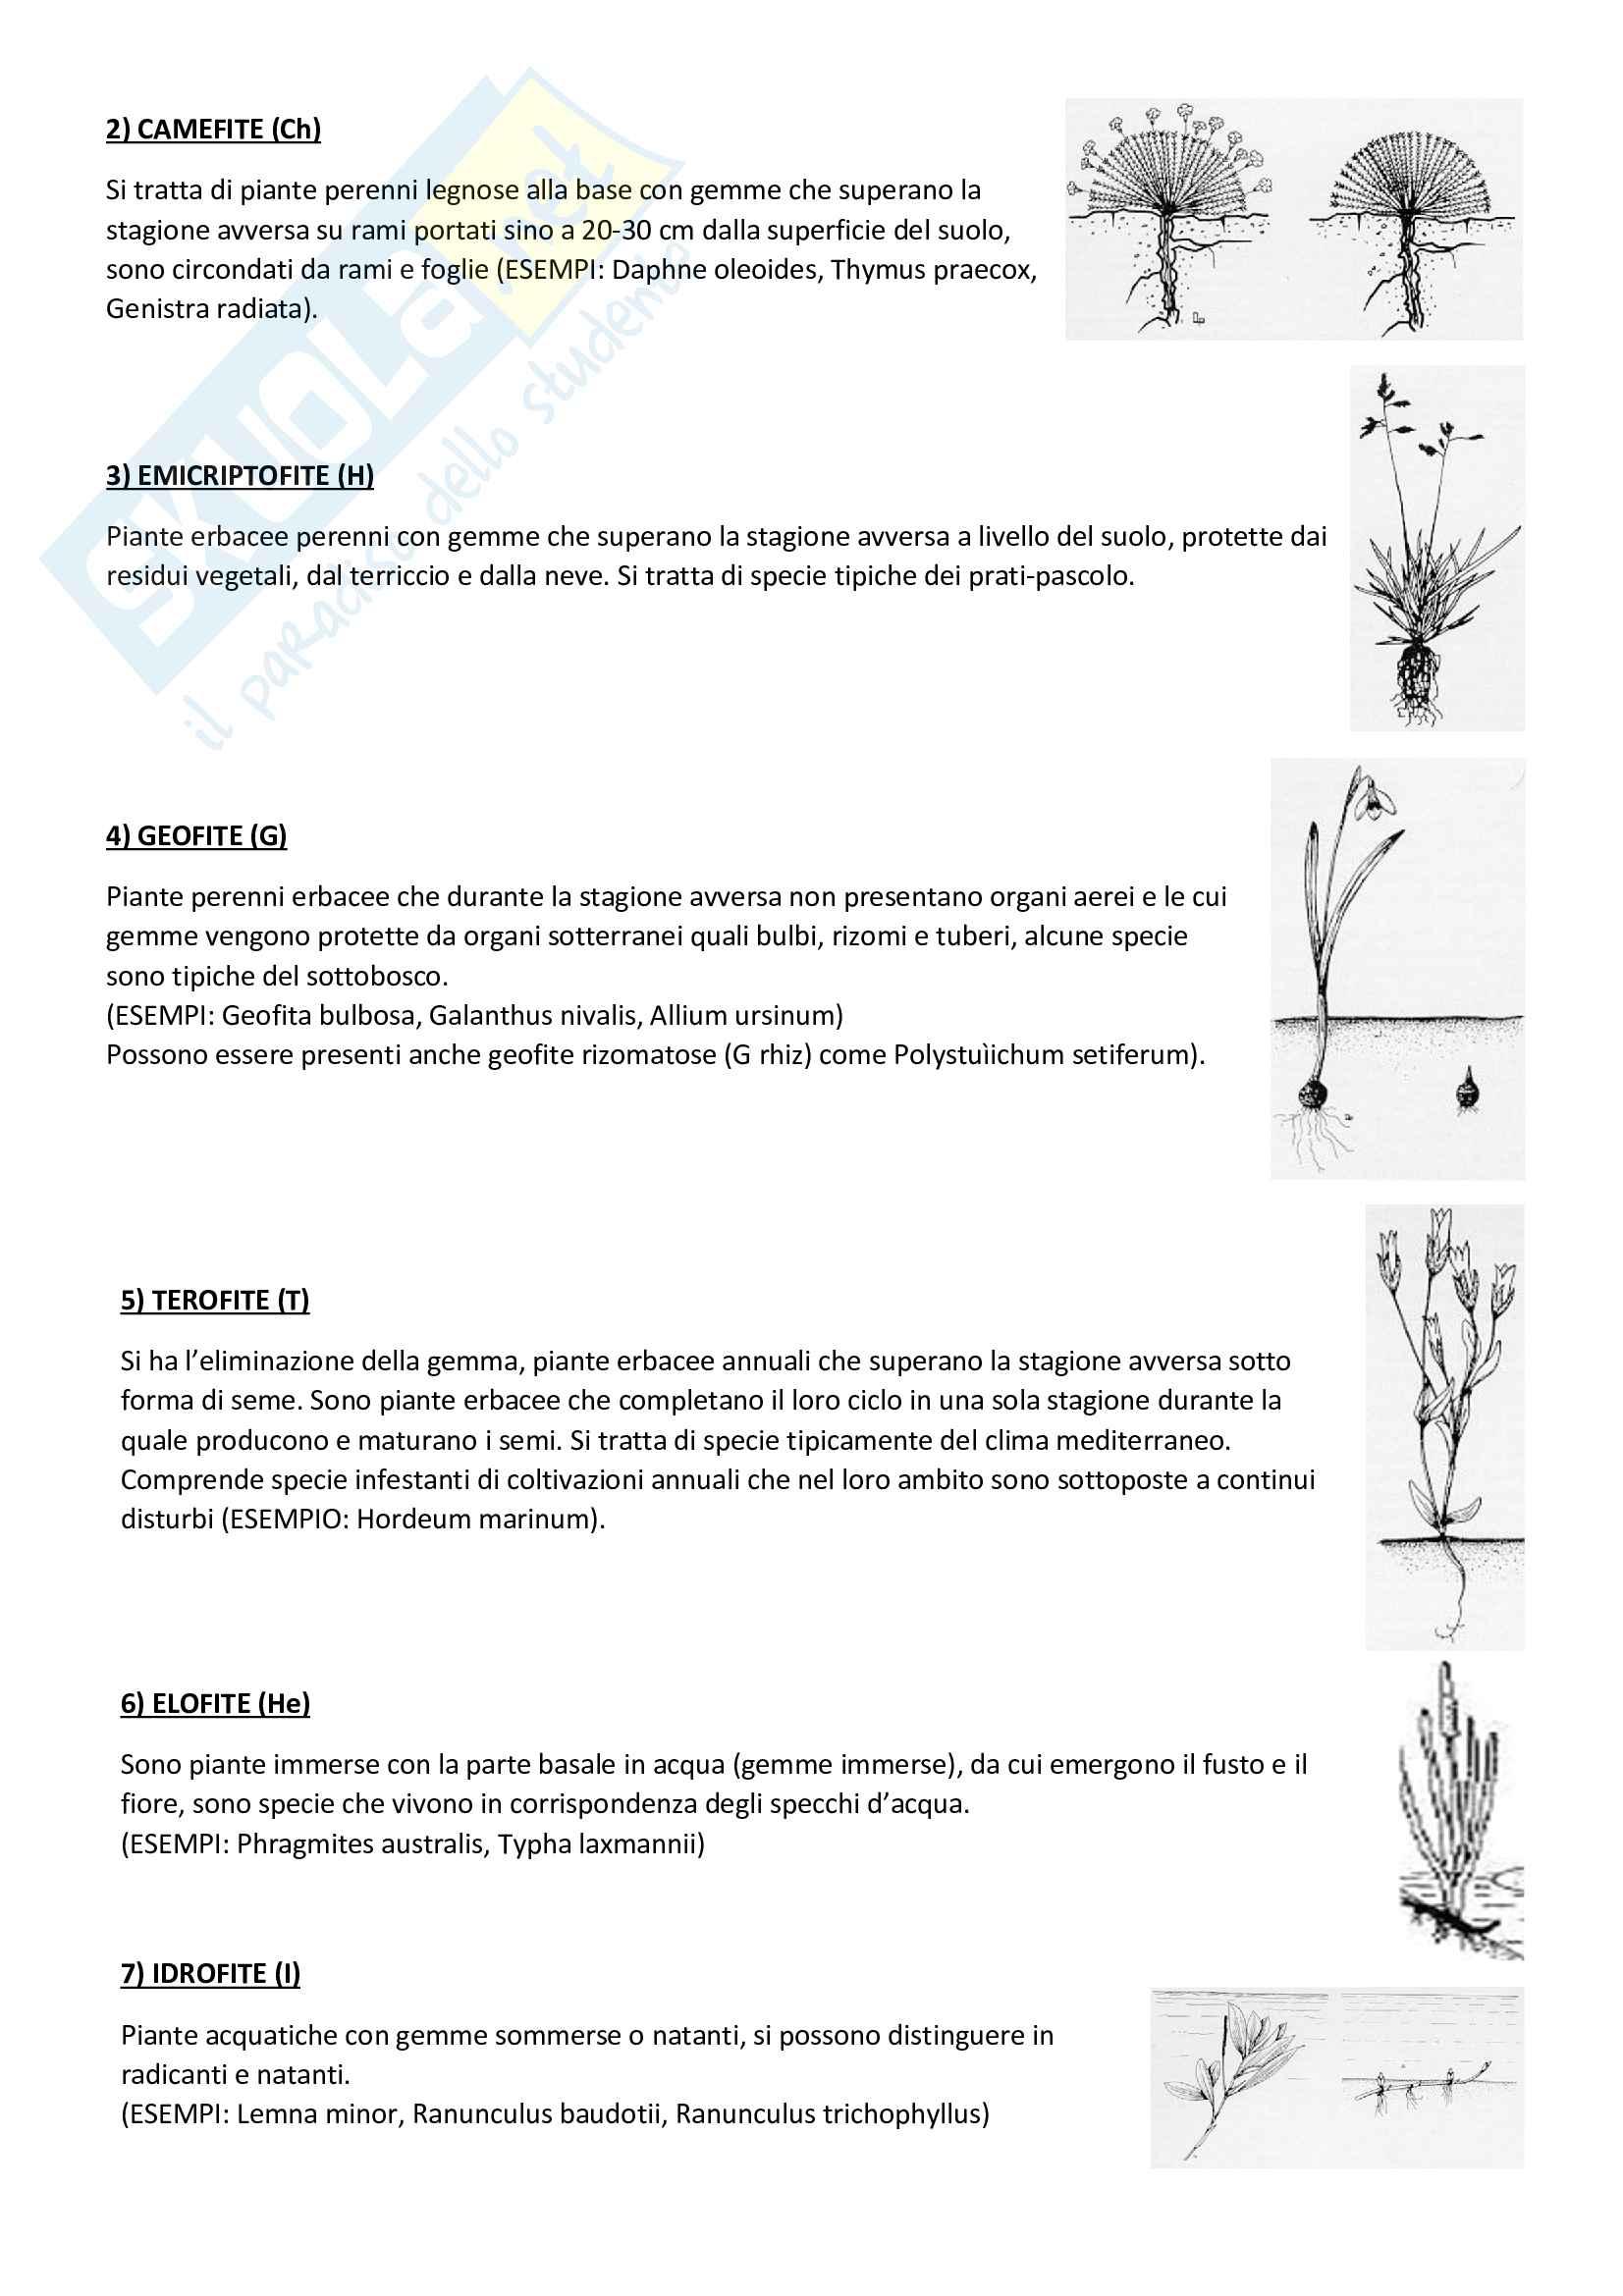 Ecologia vegetale e geobotanica Pag. 26